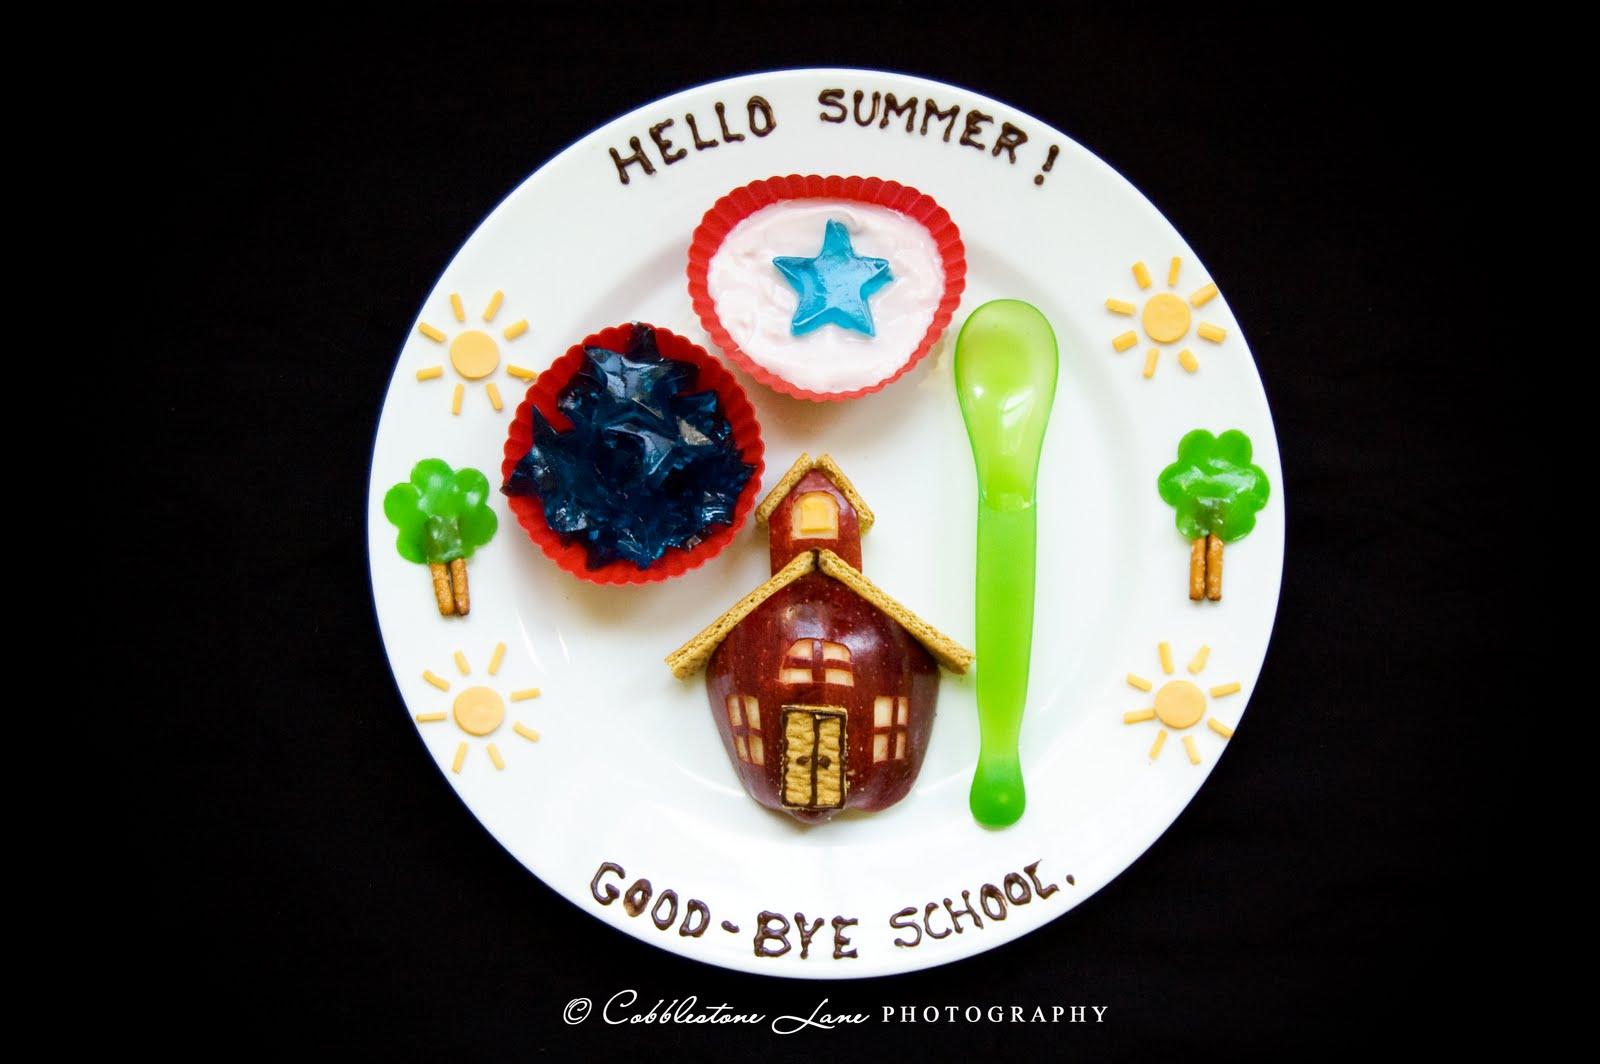 Hello Summer! Good Bye School.